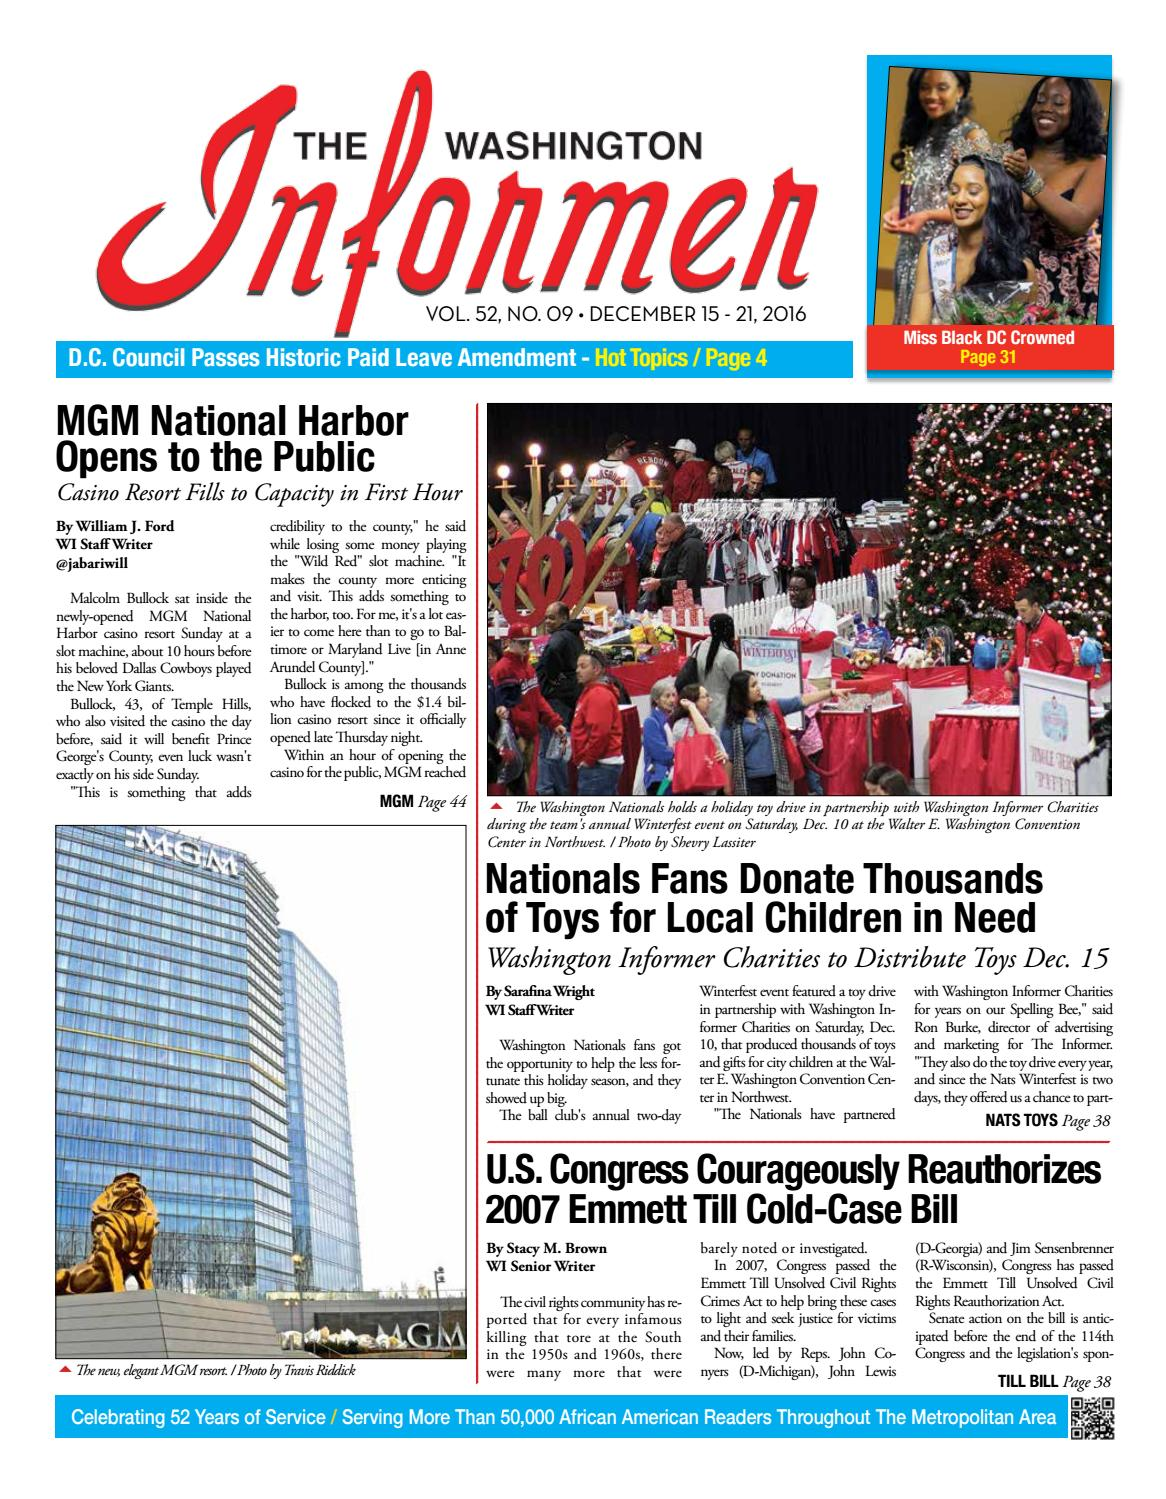 The Washington Informer - December 15, 2016 by The Washington Informer -  issuu